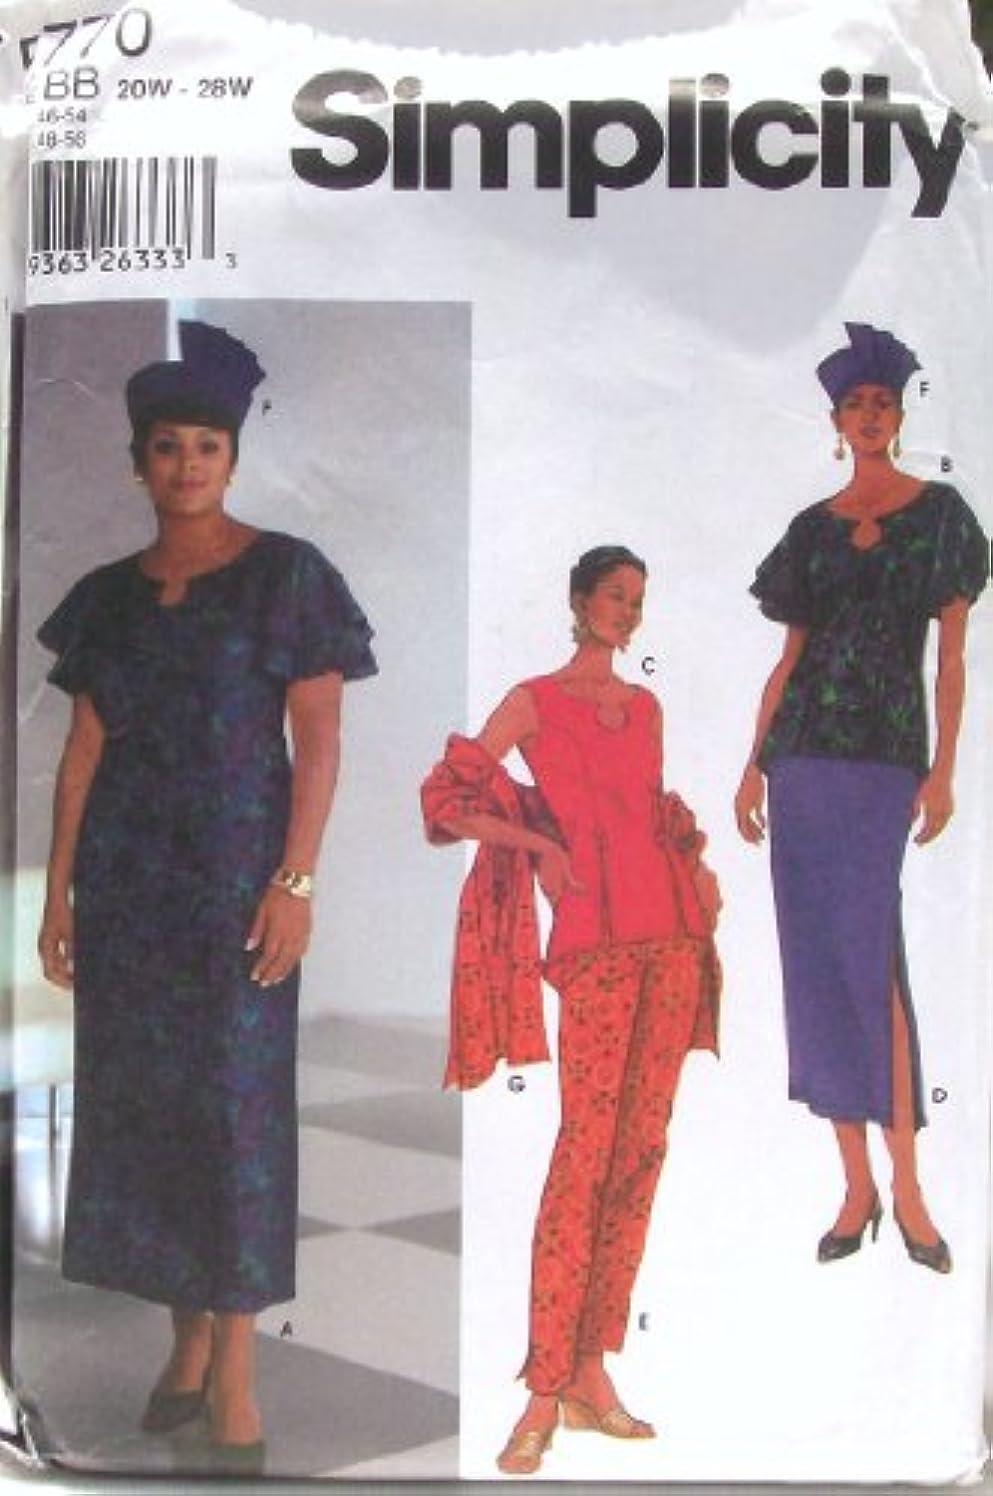 Simplicity Pattern 5770 Women's Dress or Top, Skirt, Pants, Shawl & Hat Sizes 20W-28W